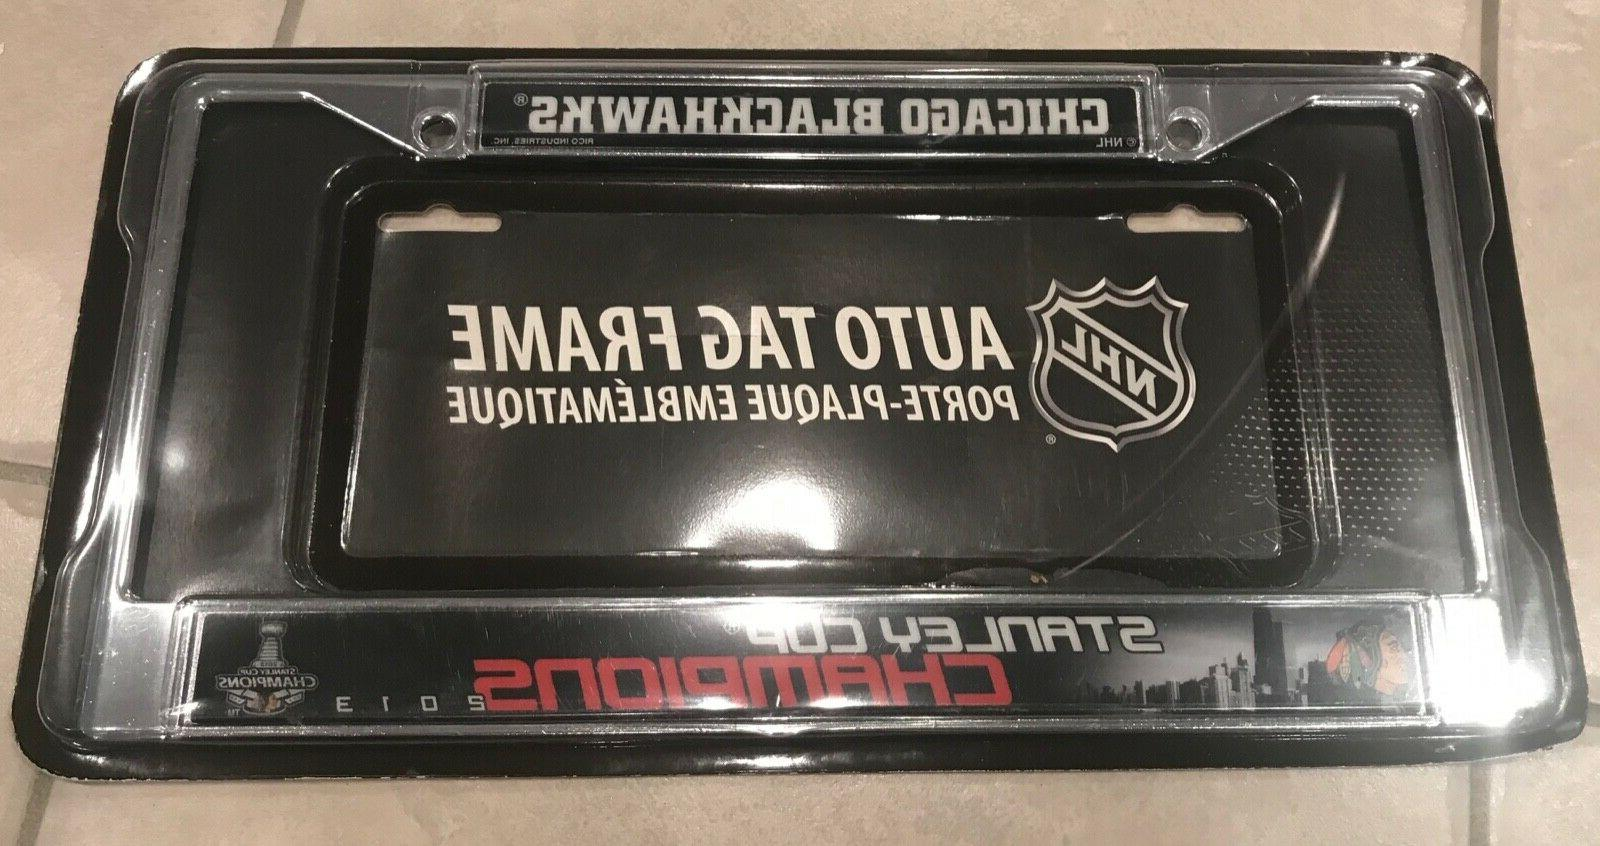 new nhl auto tag license plate frame